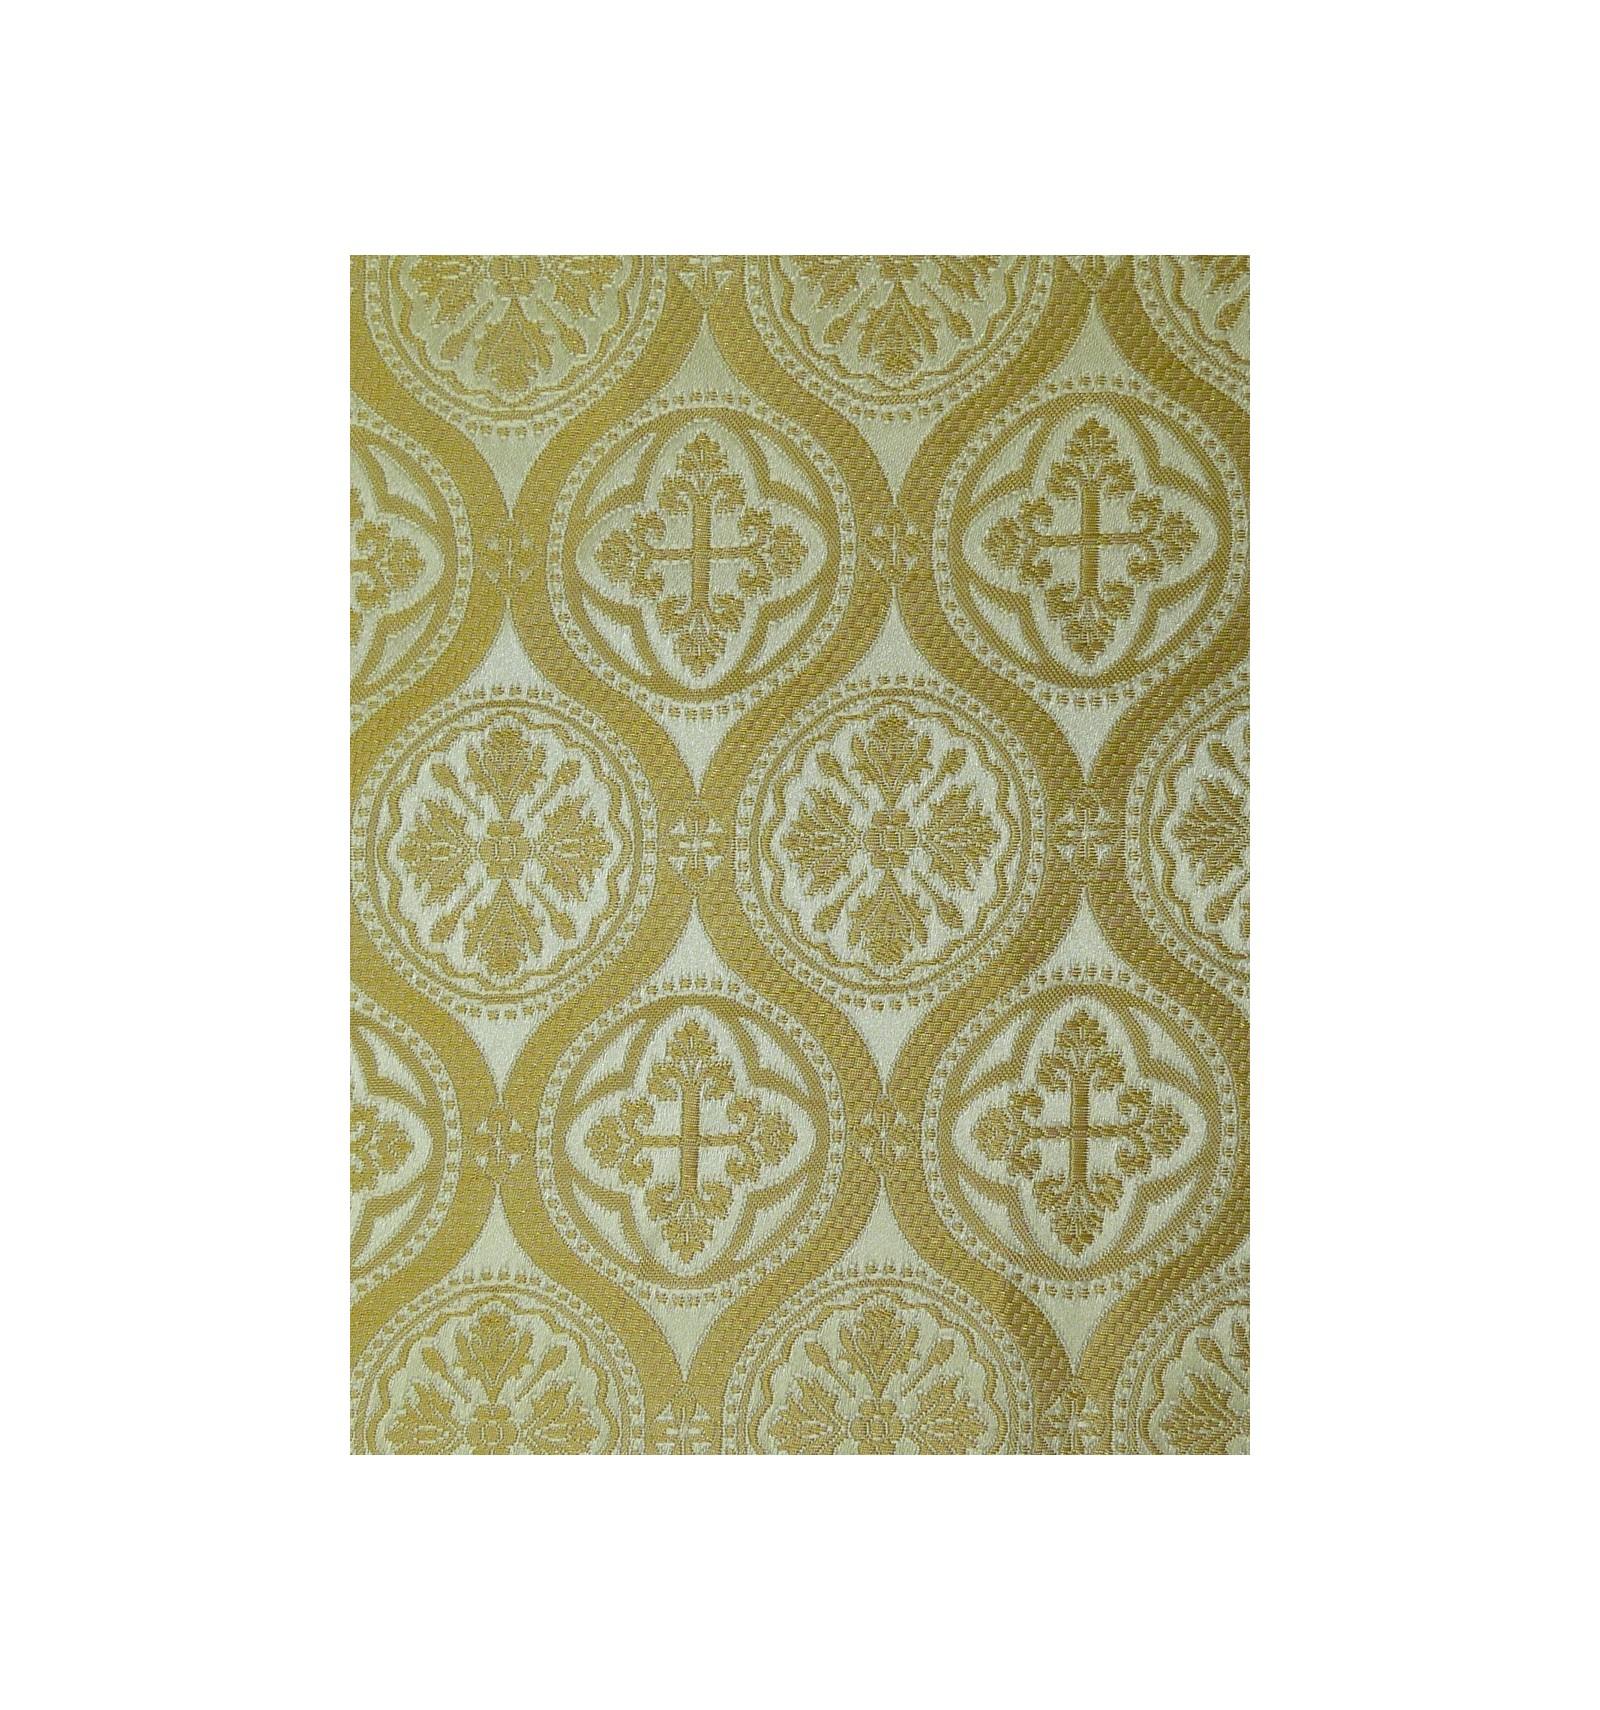 tissu damass baldam500 inter nos chasuble. Black Bedroom Furniture Sets. Home Design Ideas